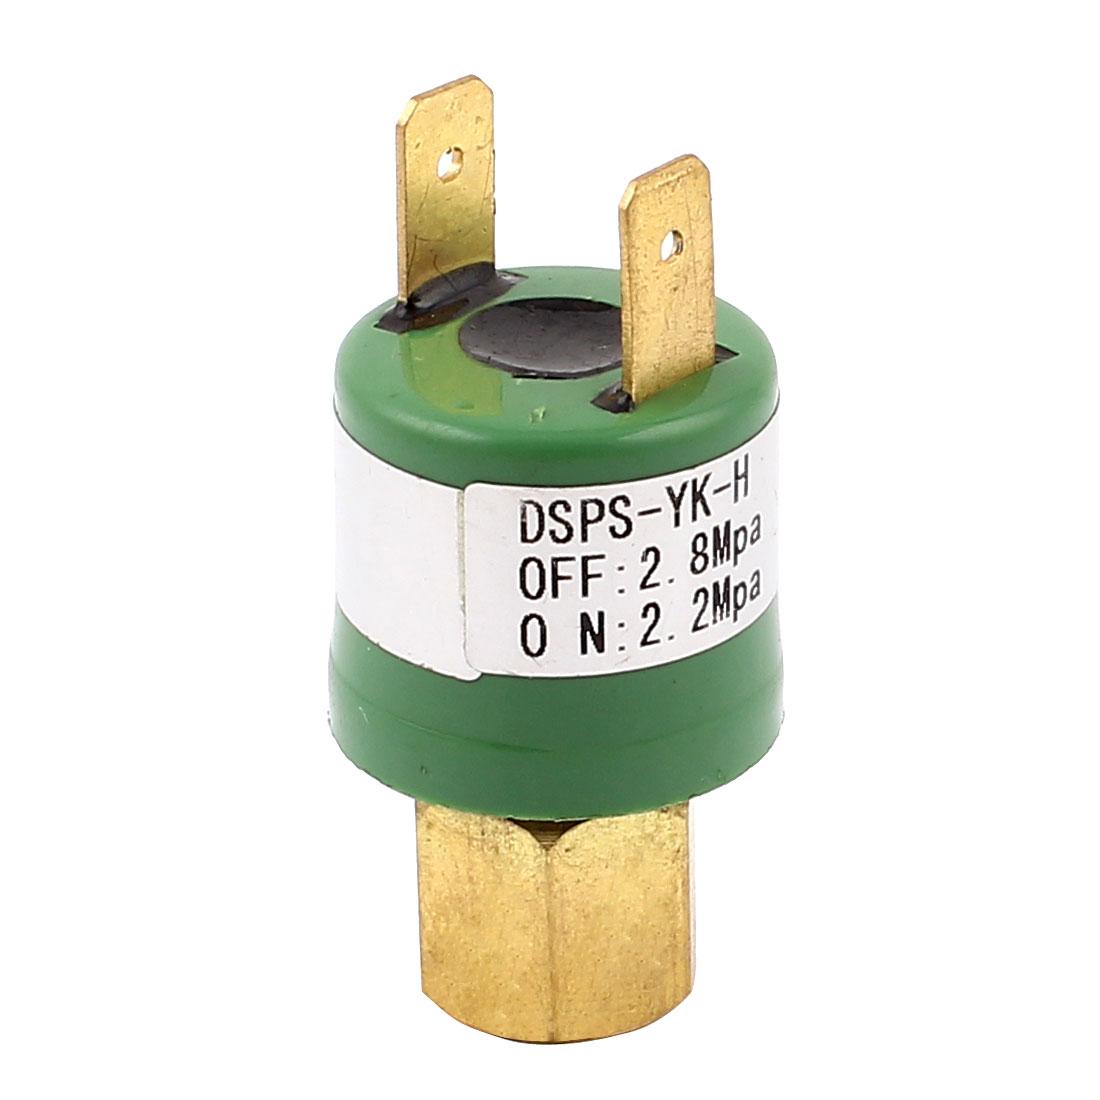 Unique Bargains Air Conditioner Refrigeration Heat Pump 2.2-2.8Mpa Pressure Control Switch